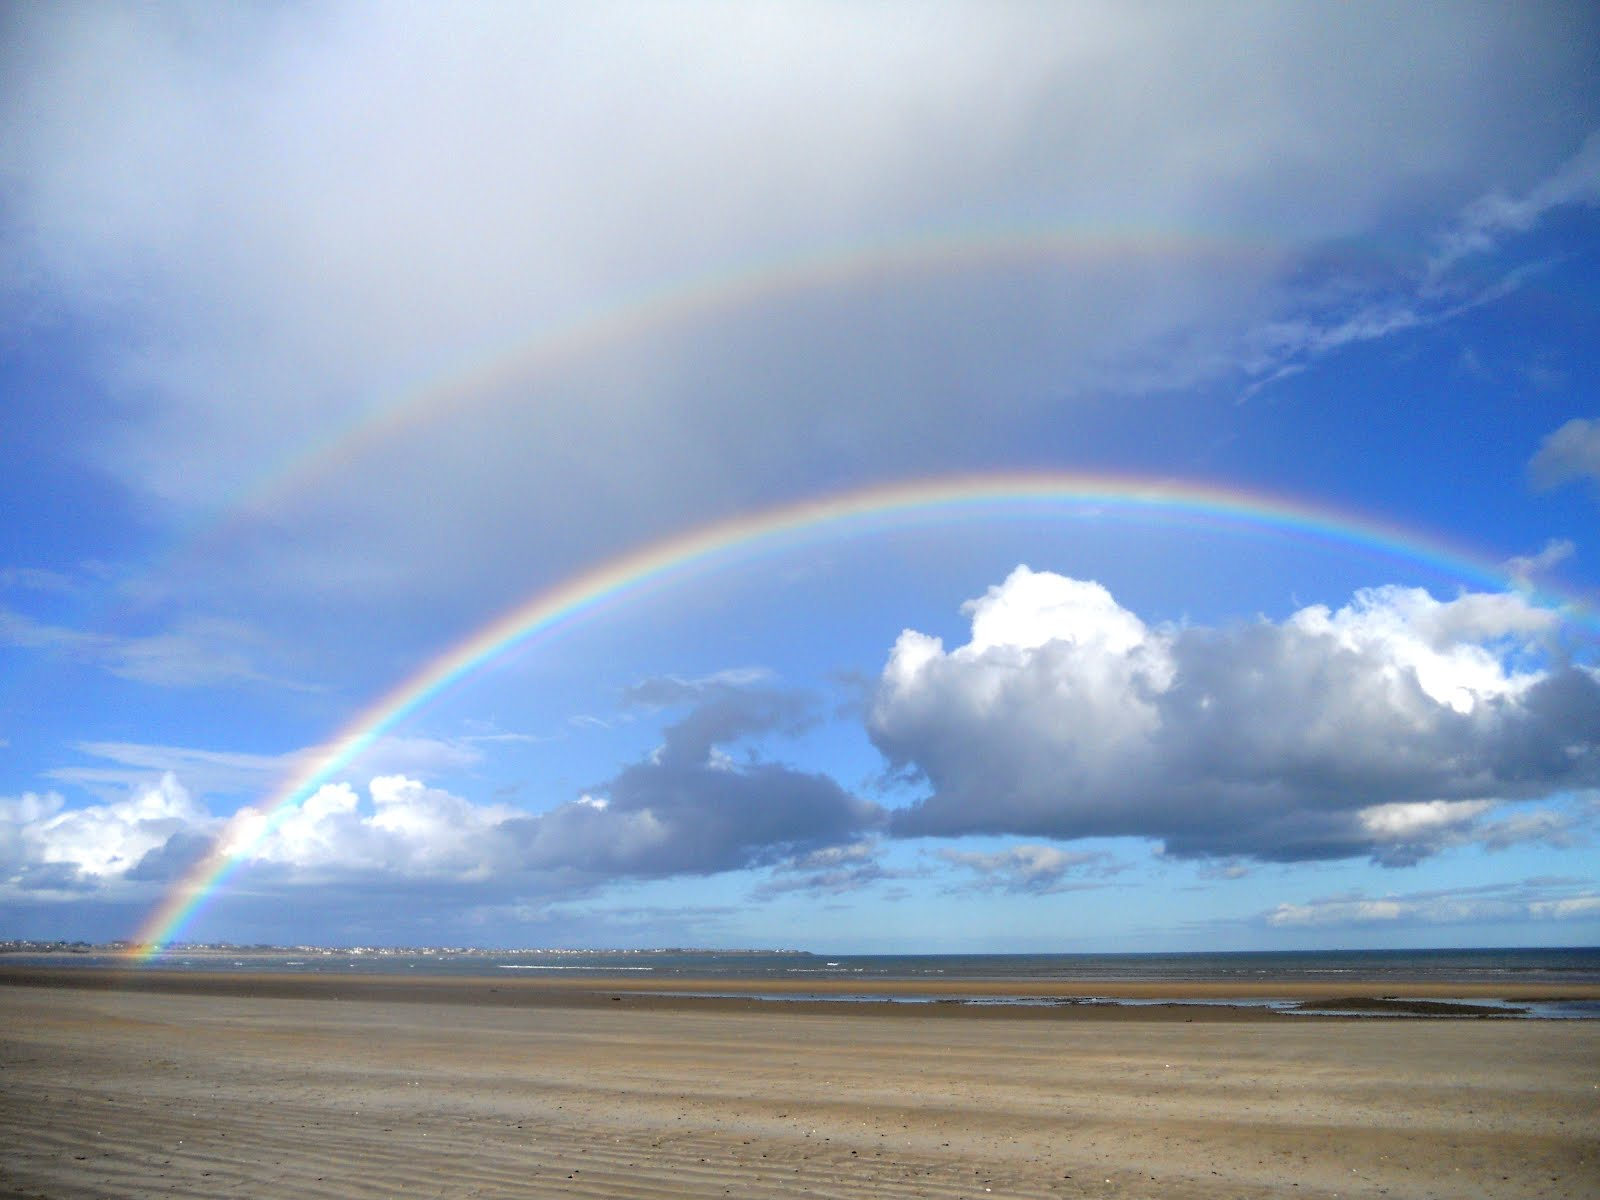 Real Rainbows At The Beach | www.pixshark.com - Images ...